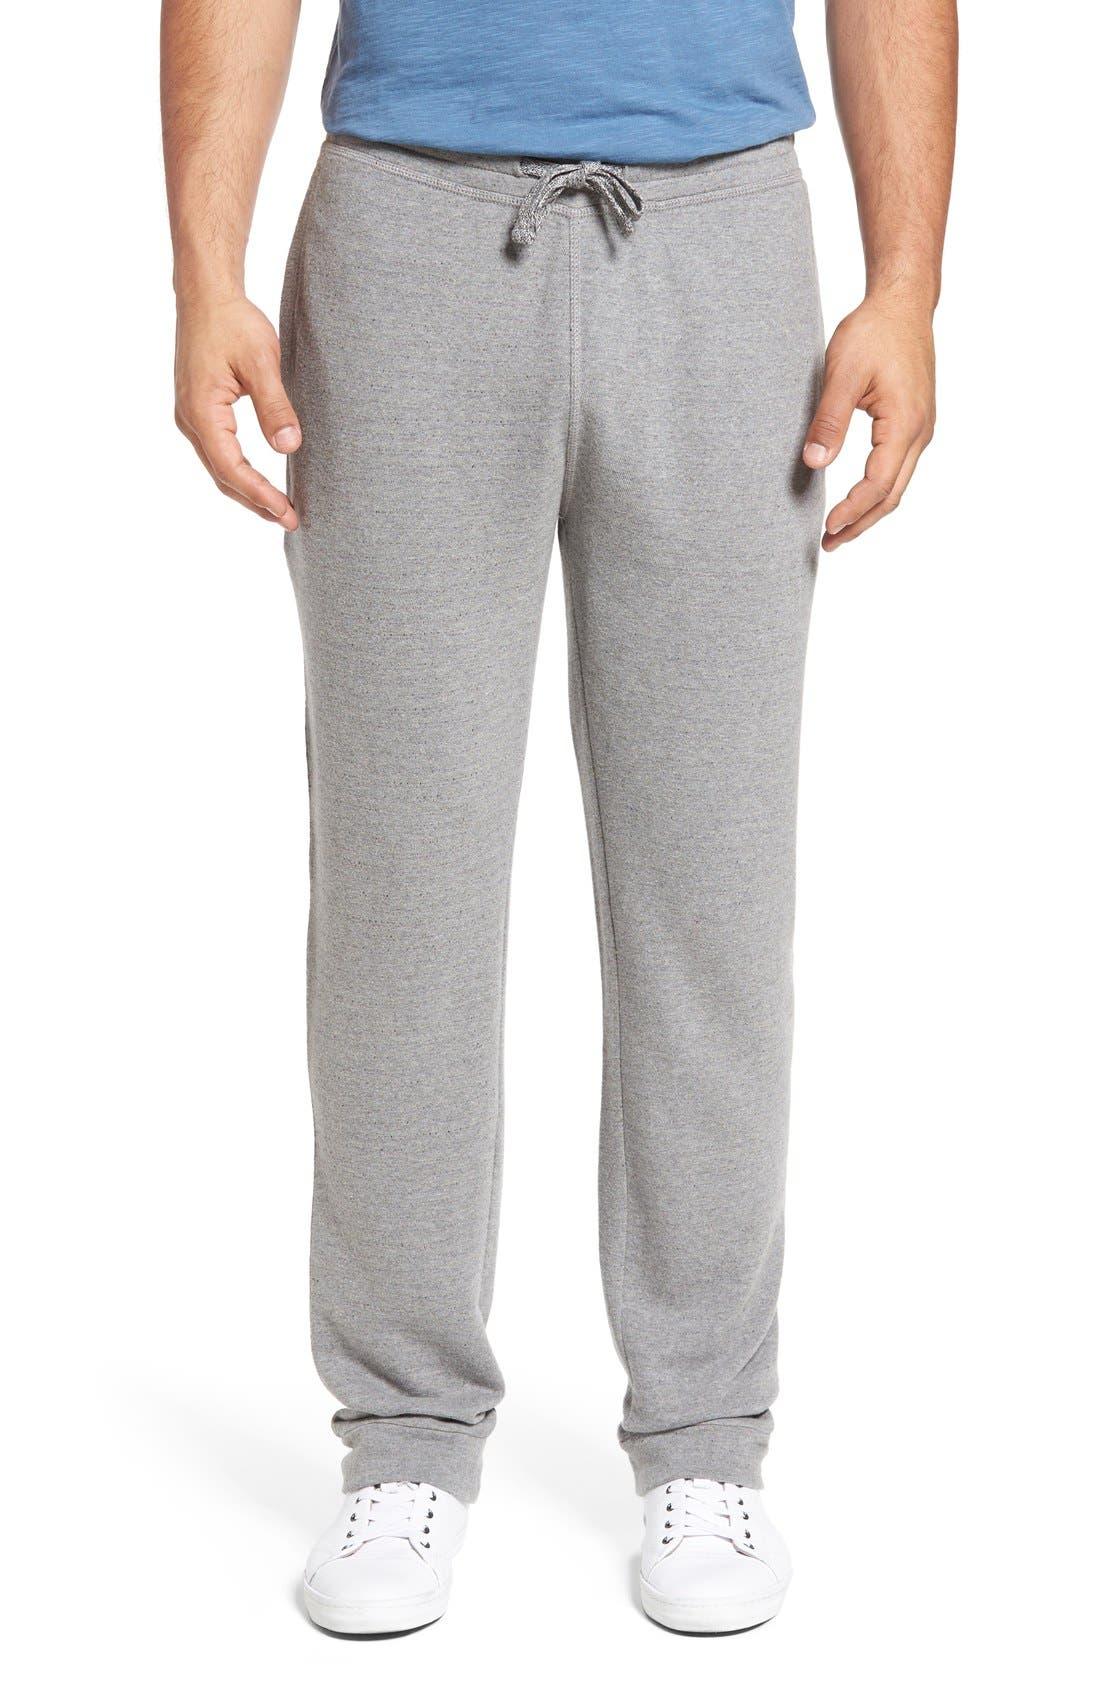 Alternate Image 1 Selected - Cutter & Buck 'Gleann' Knit Pants